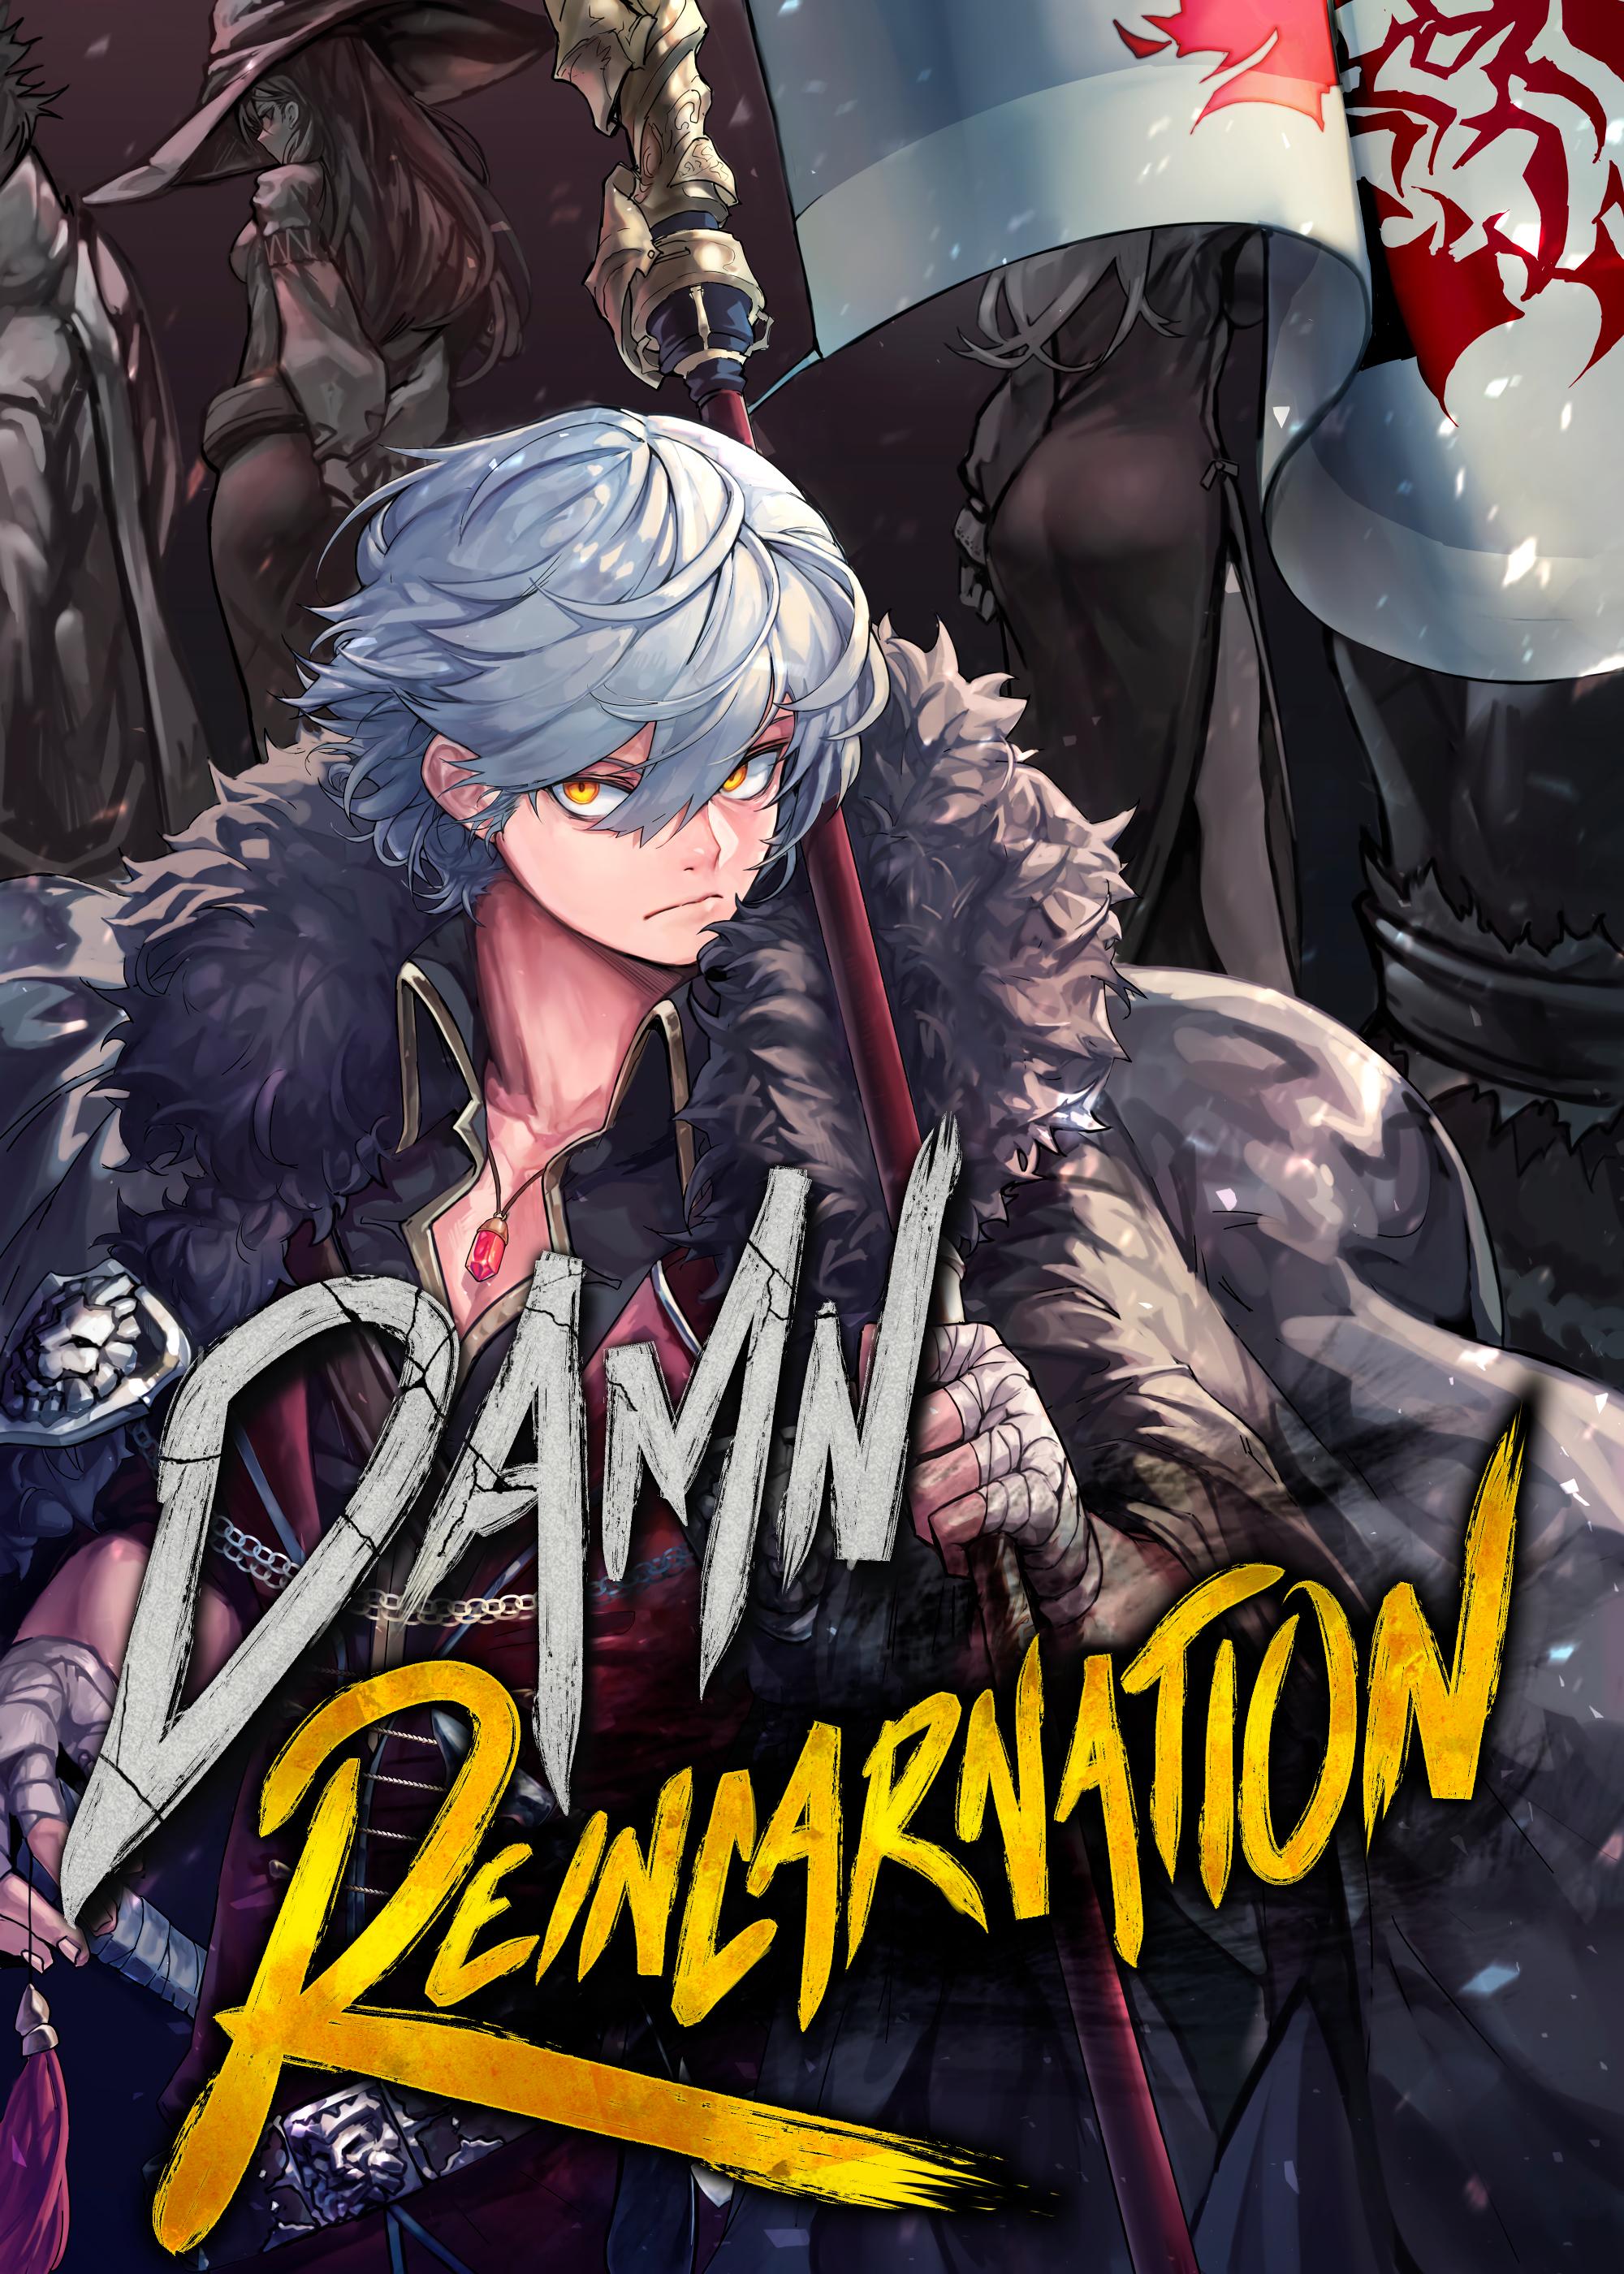 Damn Reincarnation -Novel